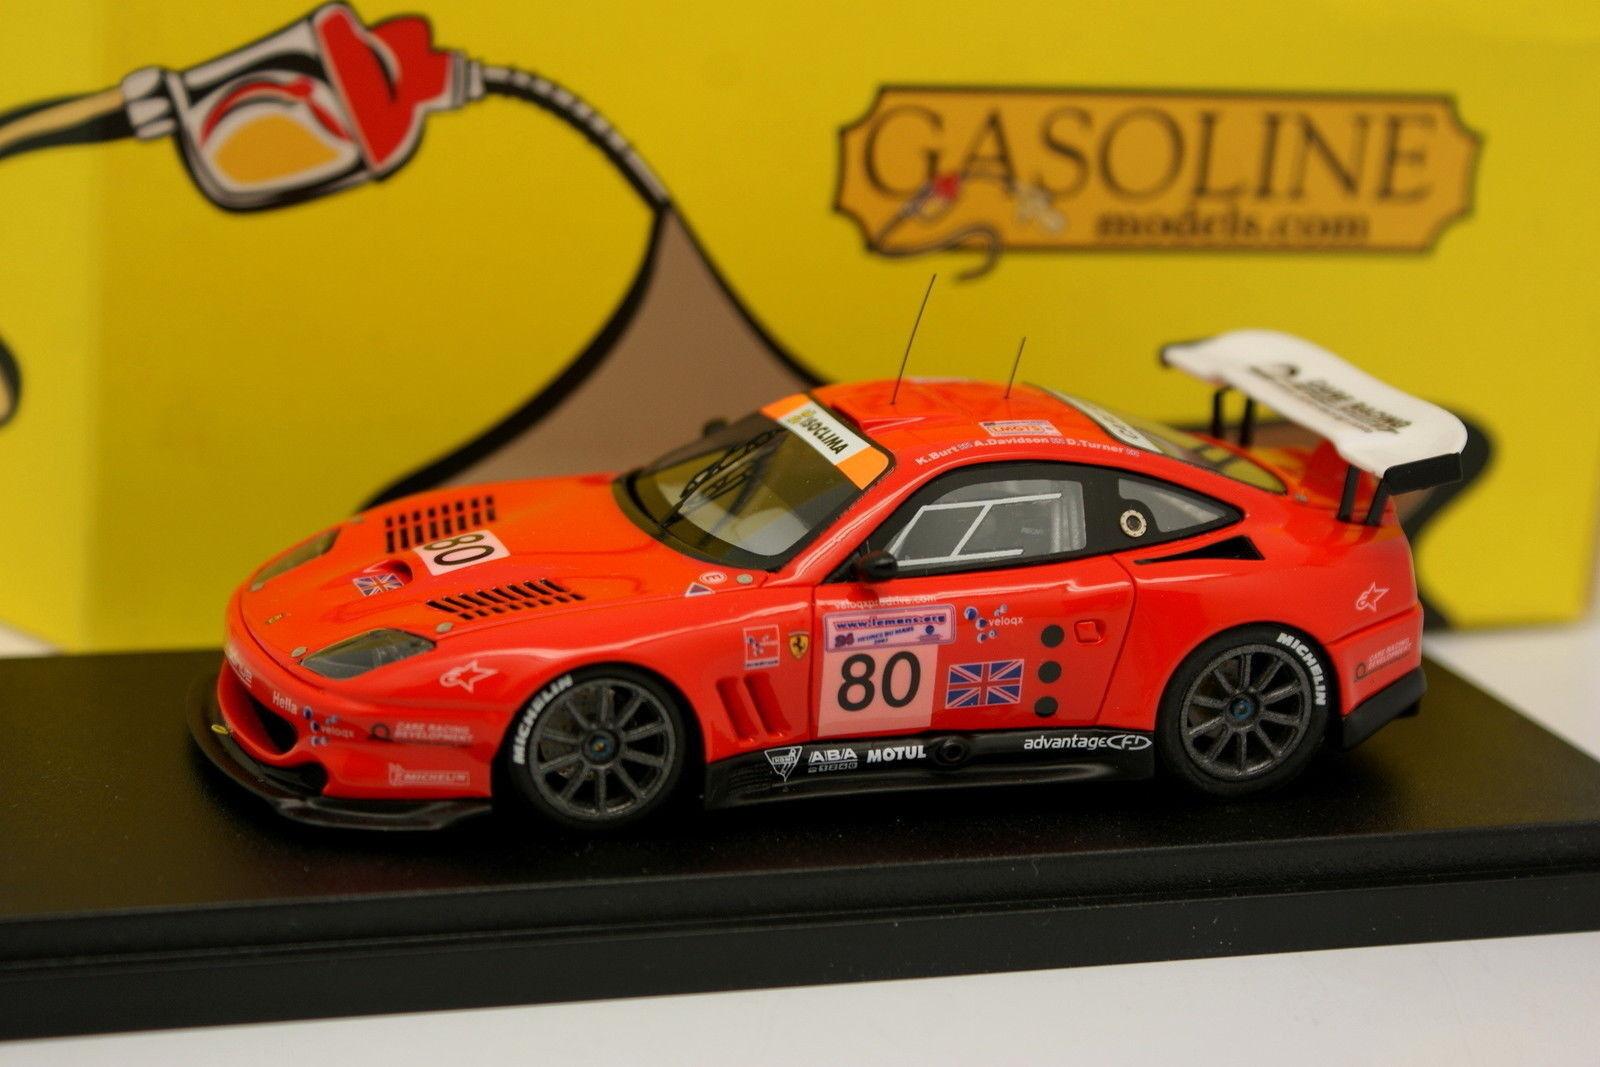 BBR Gasoline 1 43 - Ferrari 550 Maranello GTS Prodrive Le Mans 2003 N°80